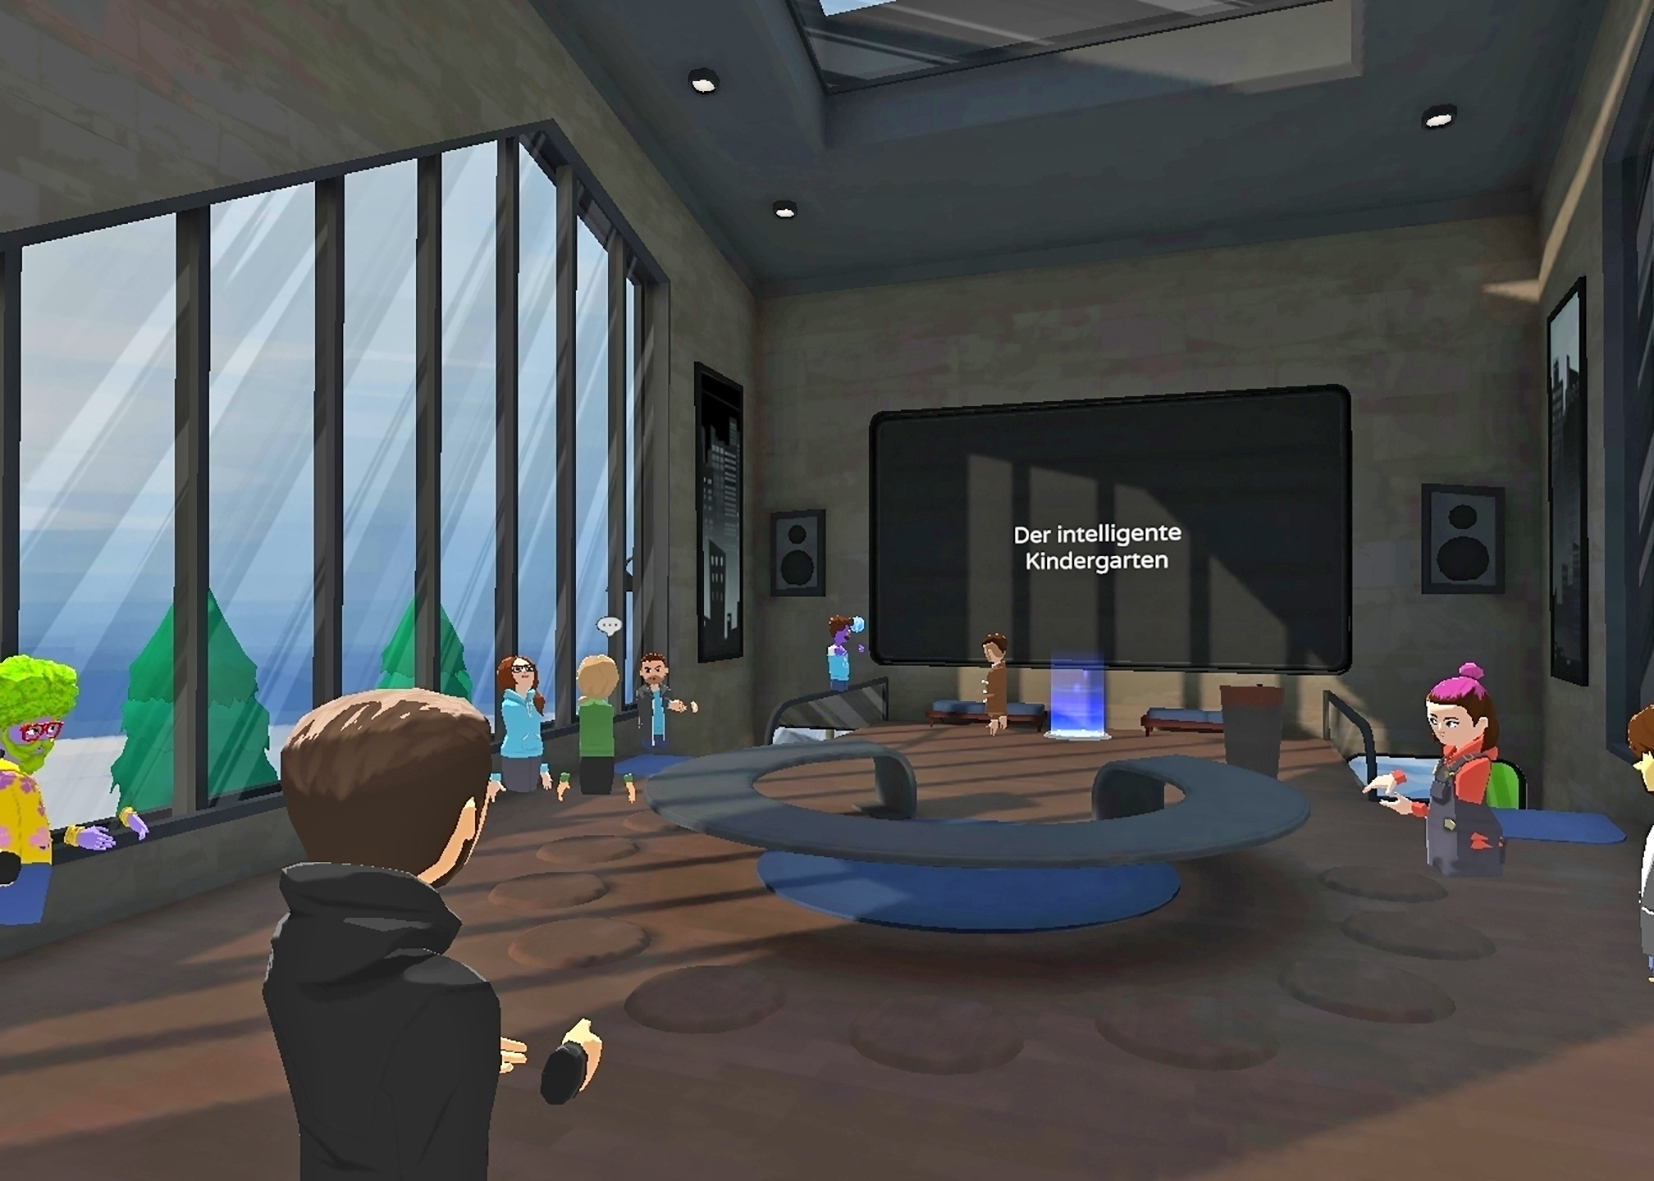 Rundgang durch Kindergarten, Szene aus Microsoft Altspace